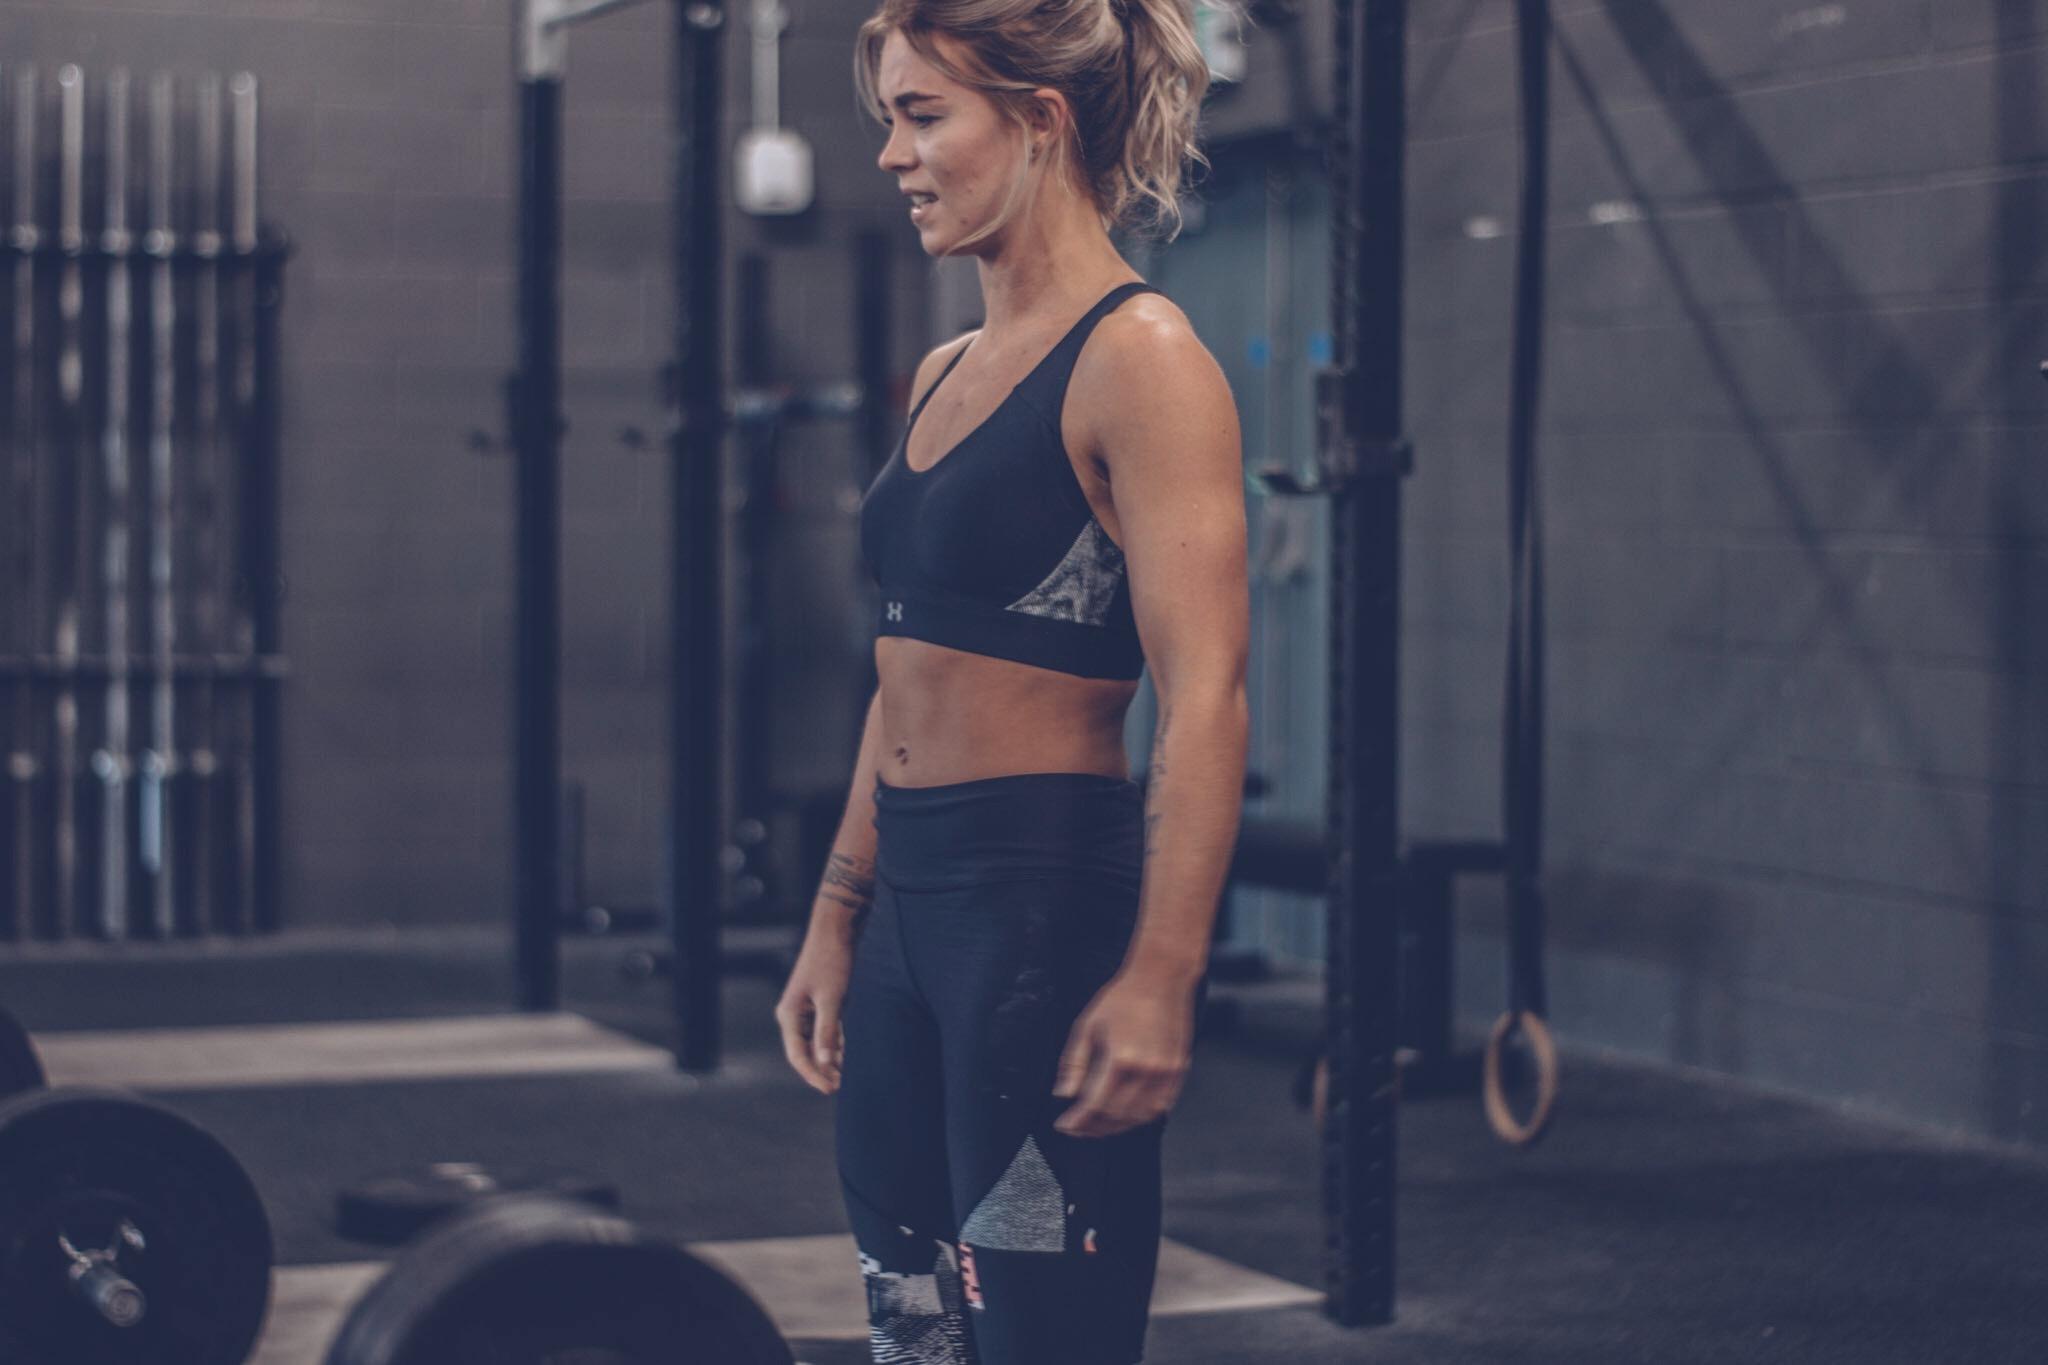 Female trainer Manchester